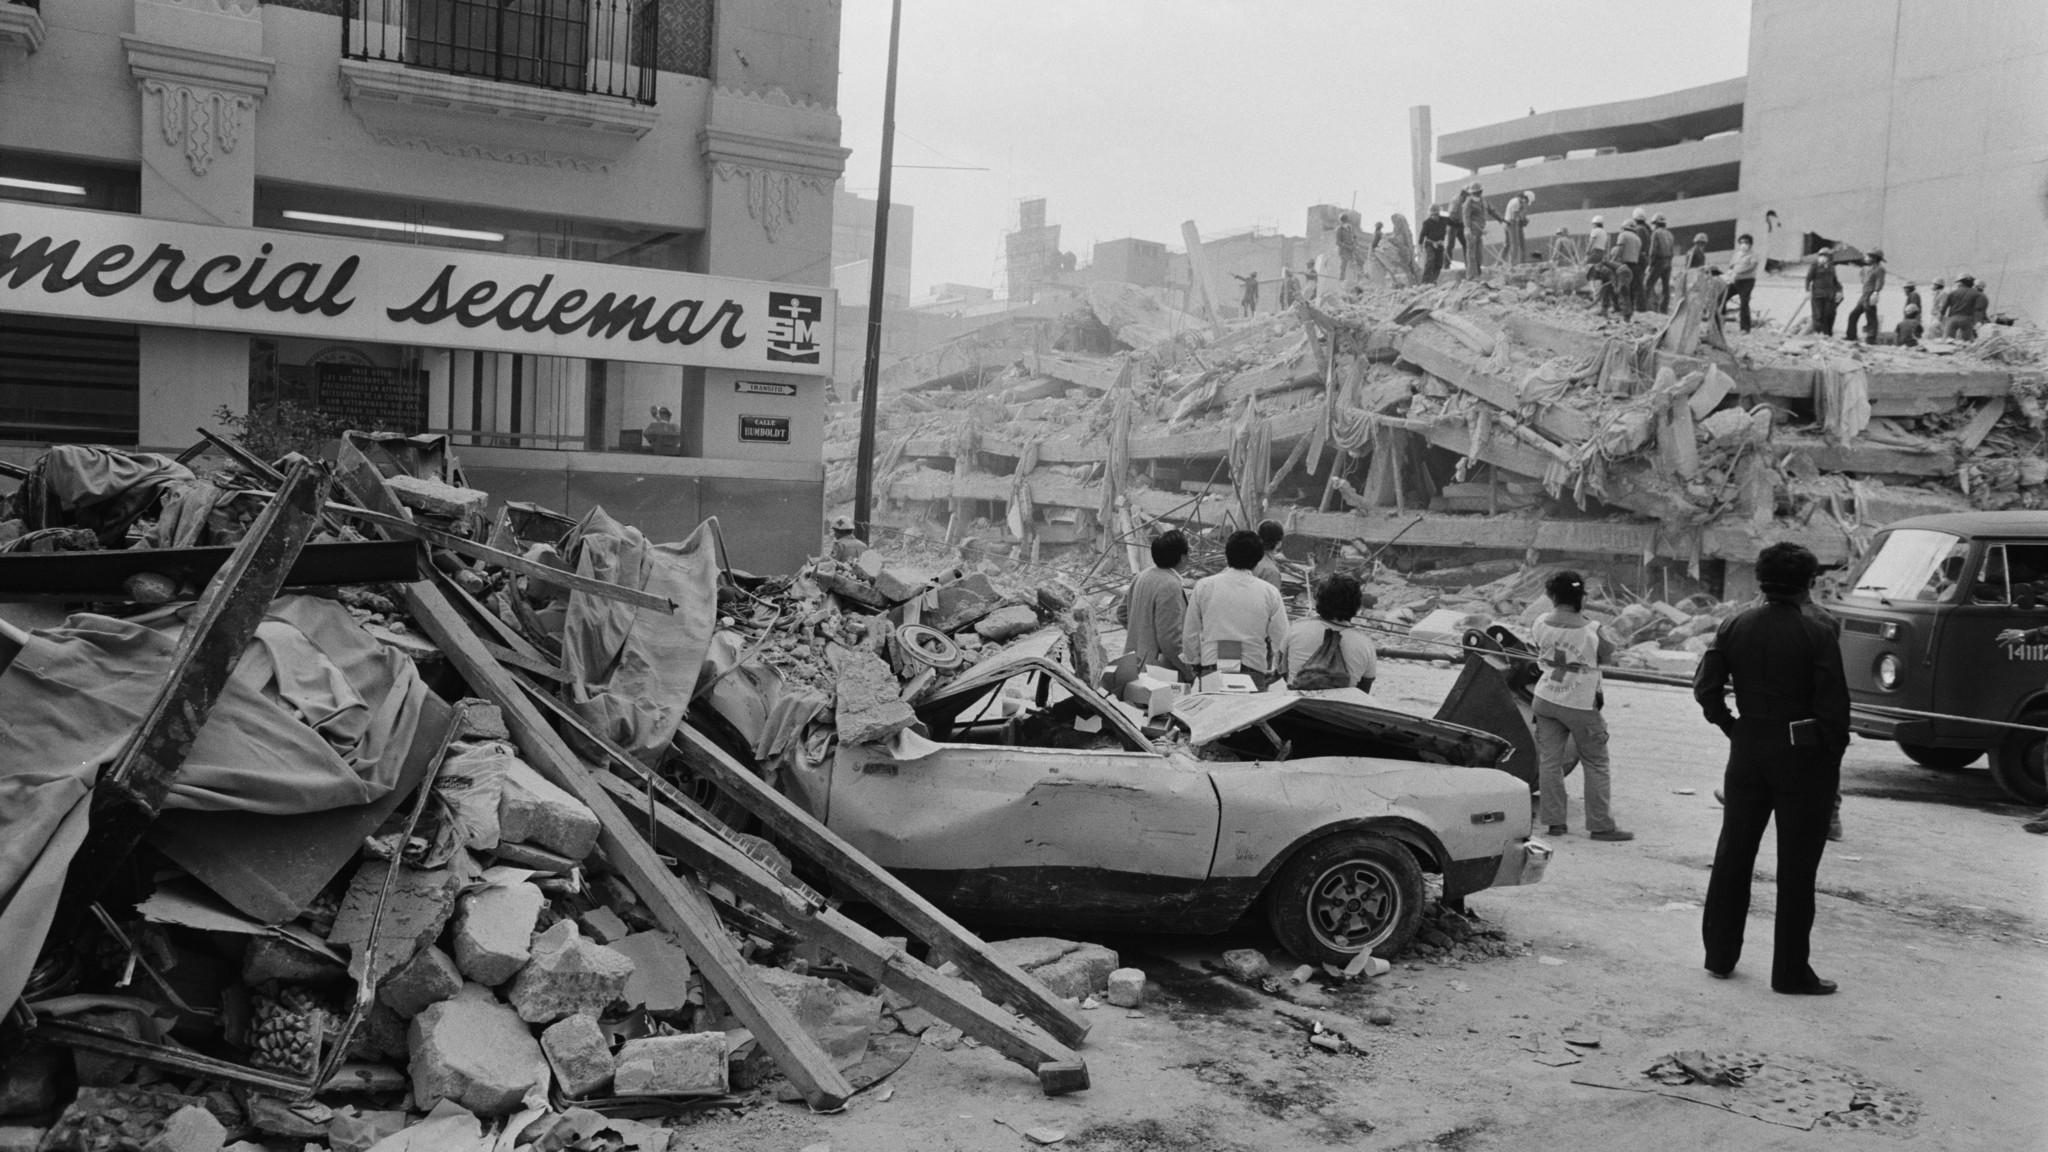 1985 Mexico City earthquake - LA Times